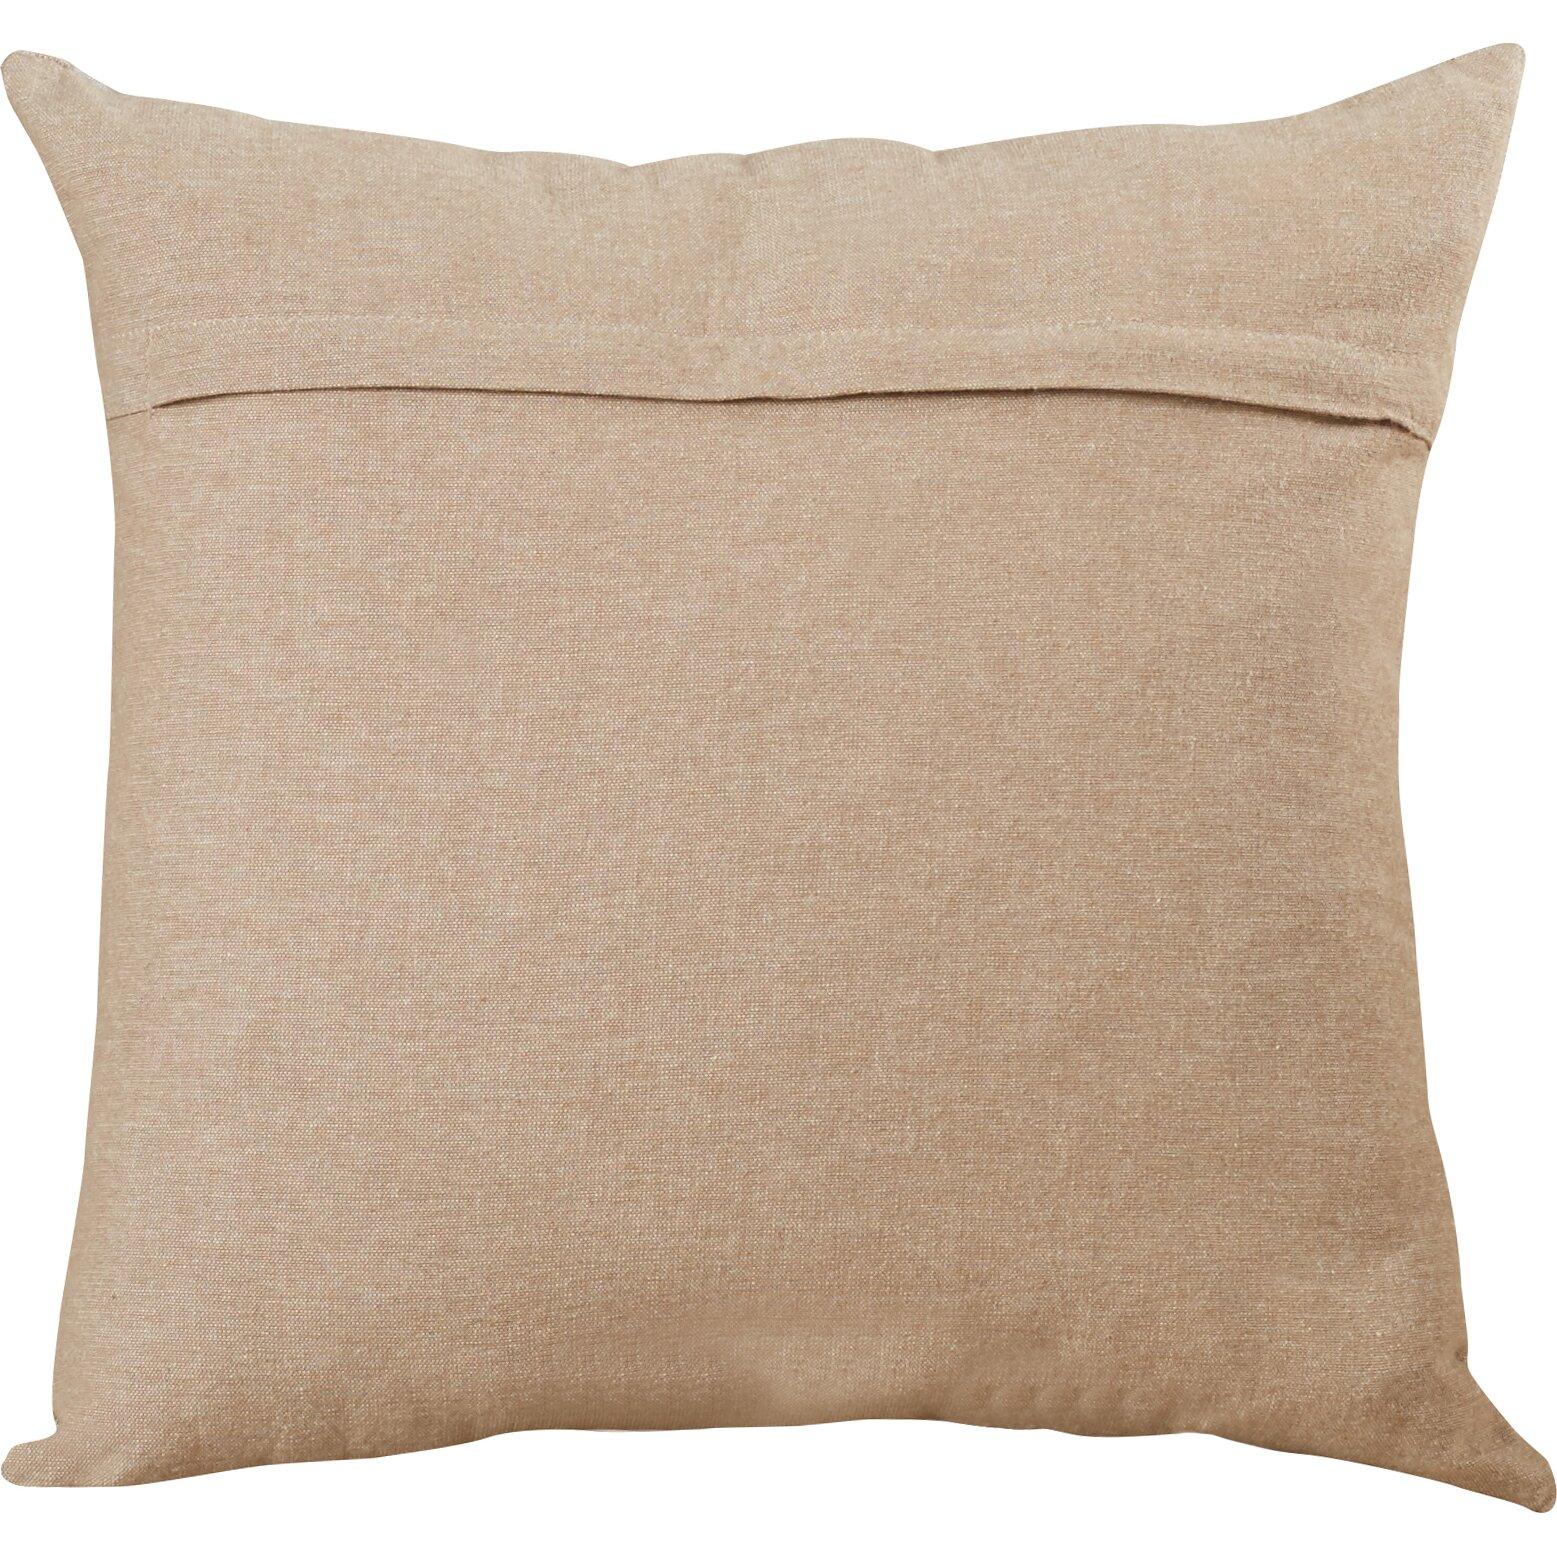 Throw Pillow Down : House of Hampton Corin Down Throw Pillow & Reviews Wayfair